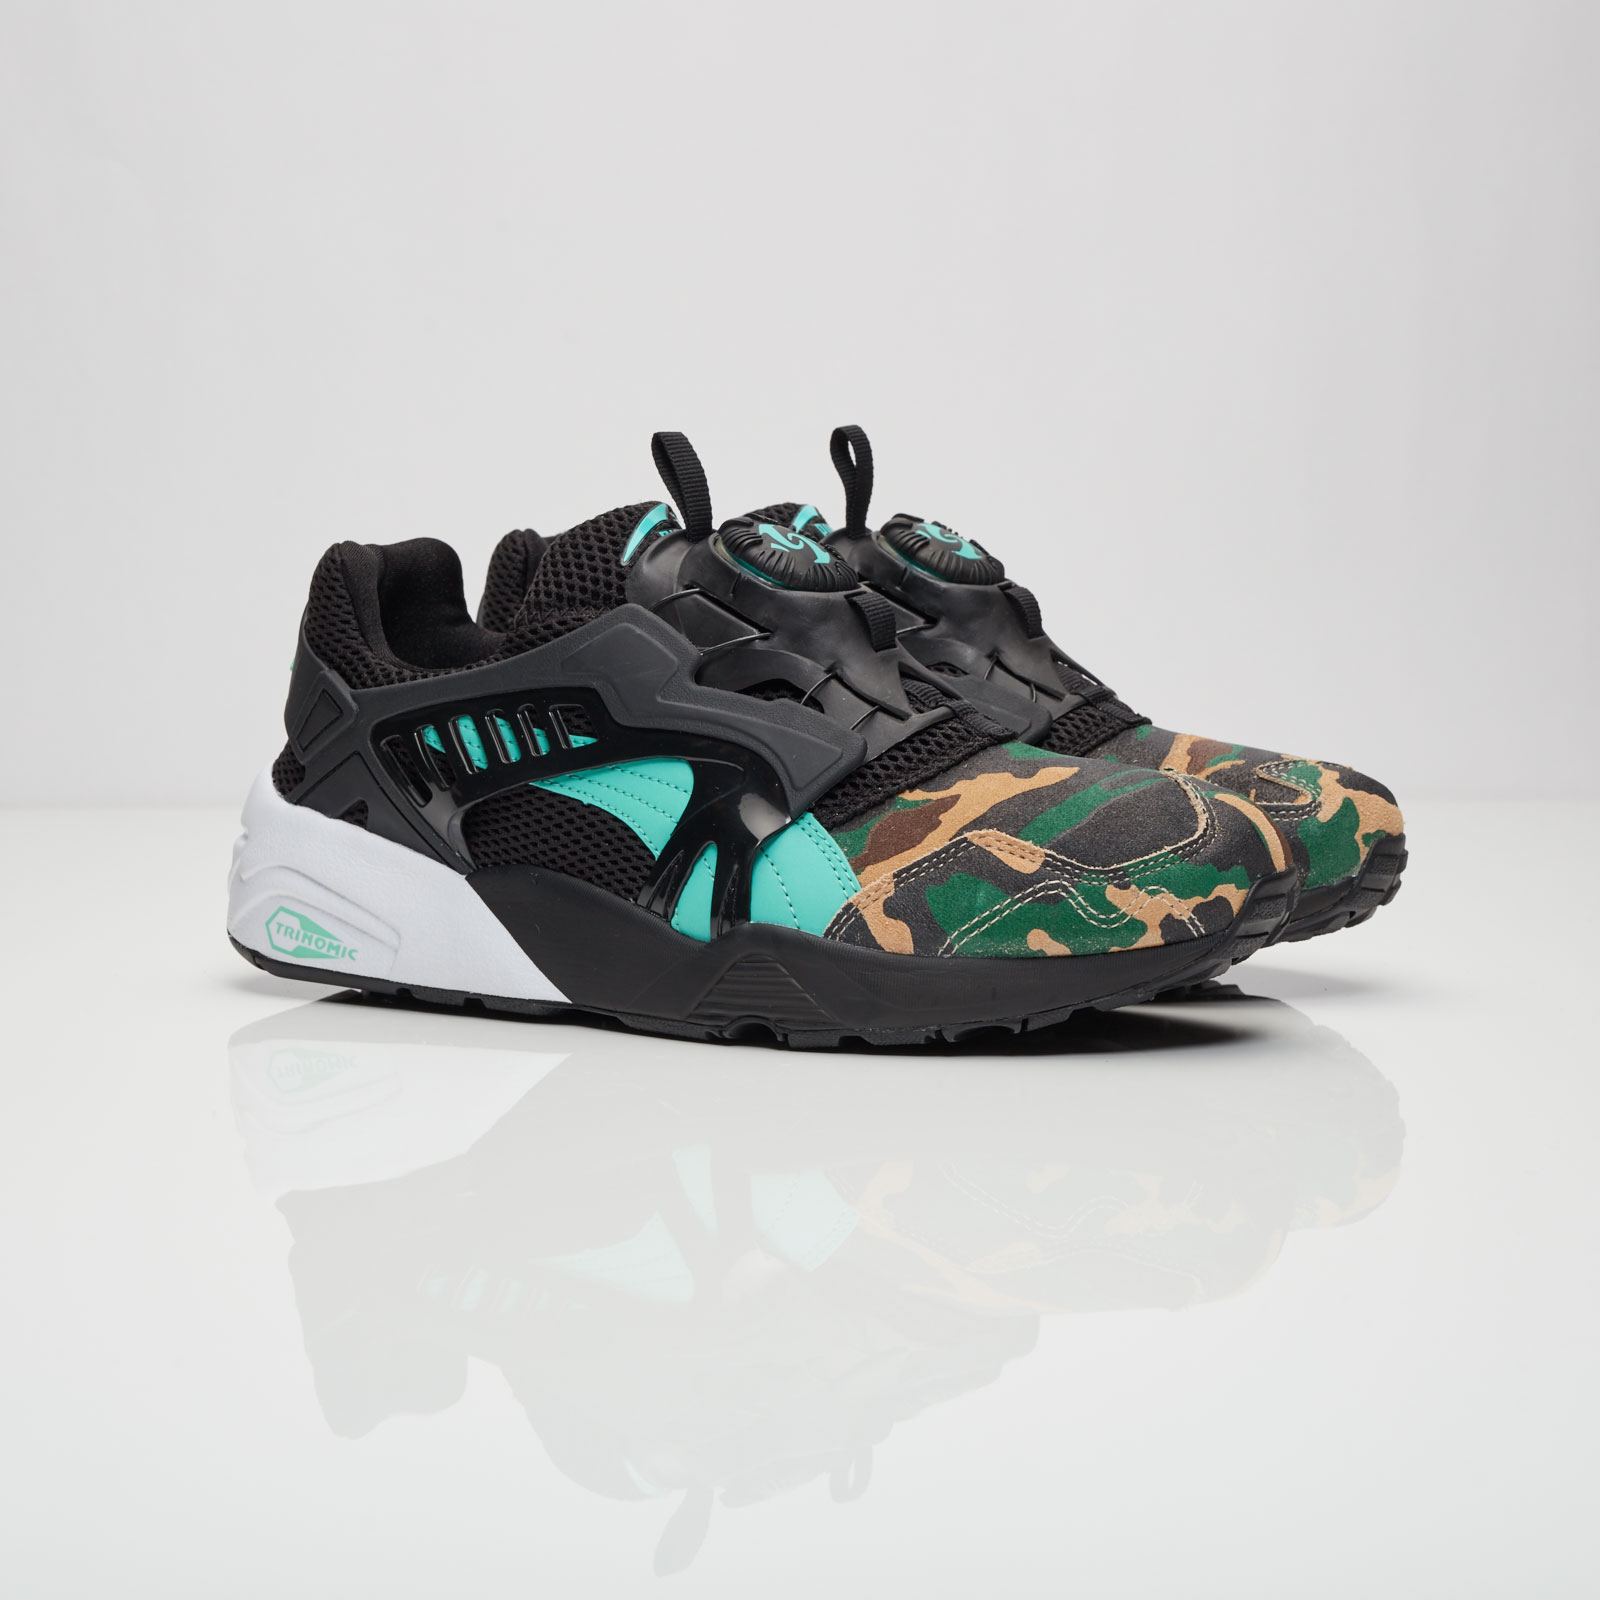 24f54aebc604 Puma Disc Blaze Night Jungle - 363060-01 - Sneakersnstuff